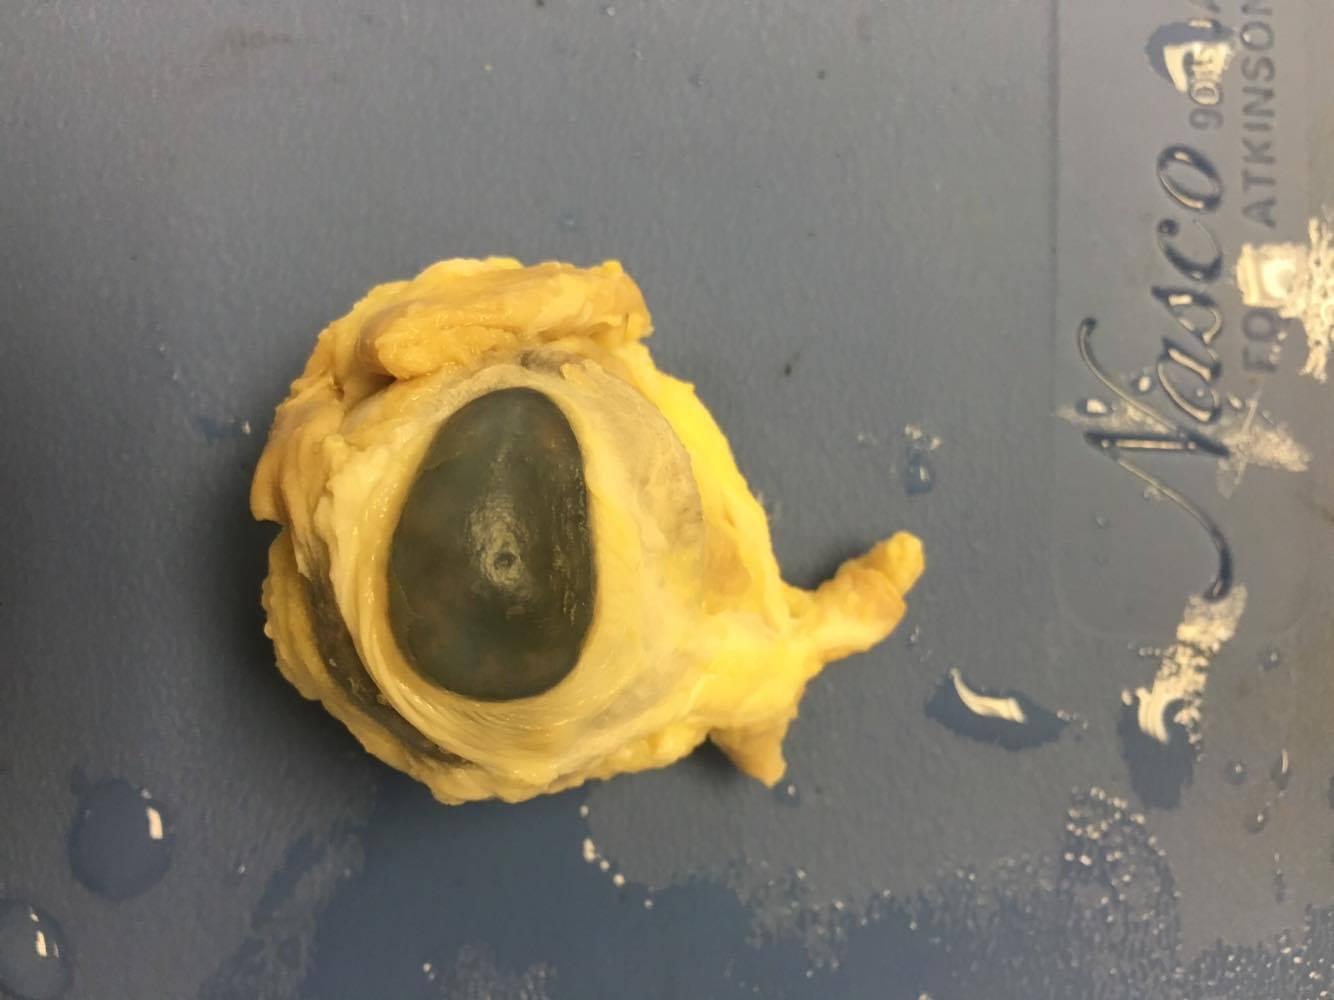 Worksheet For Eye Dissection